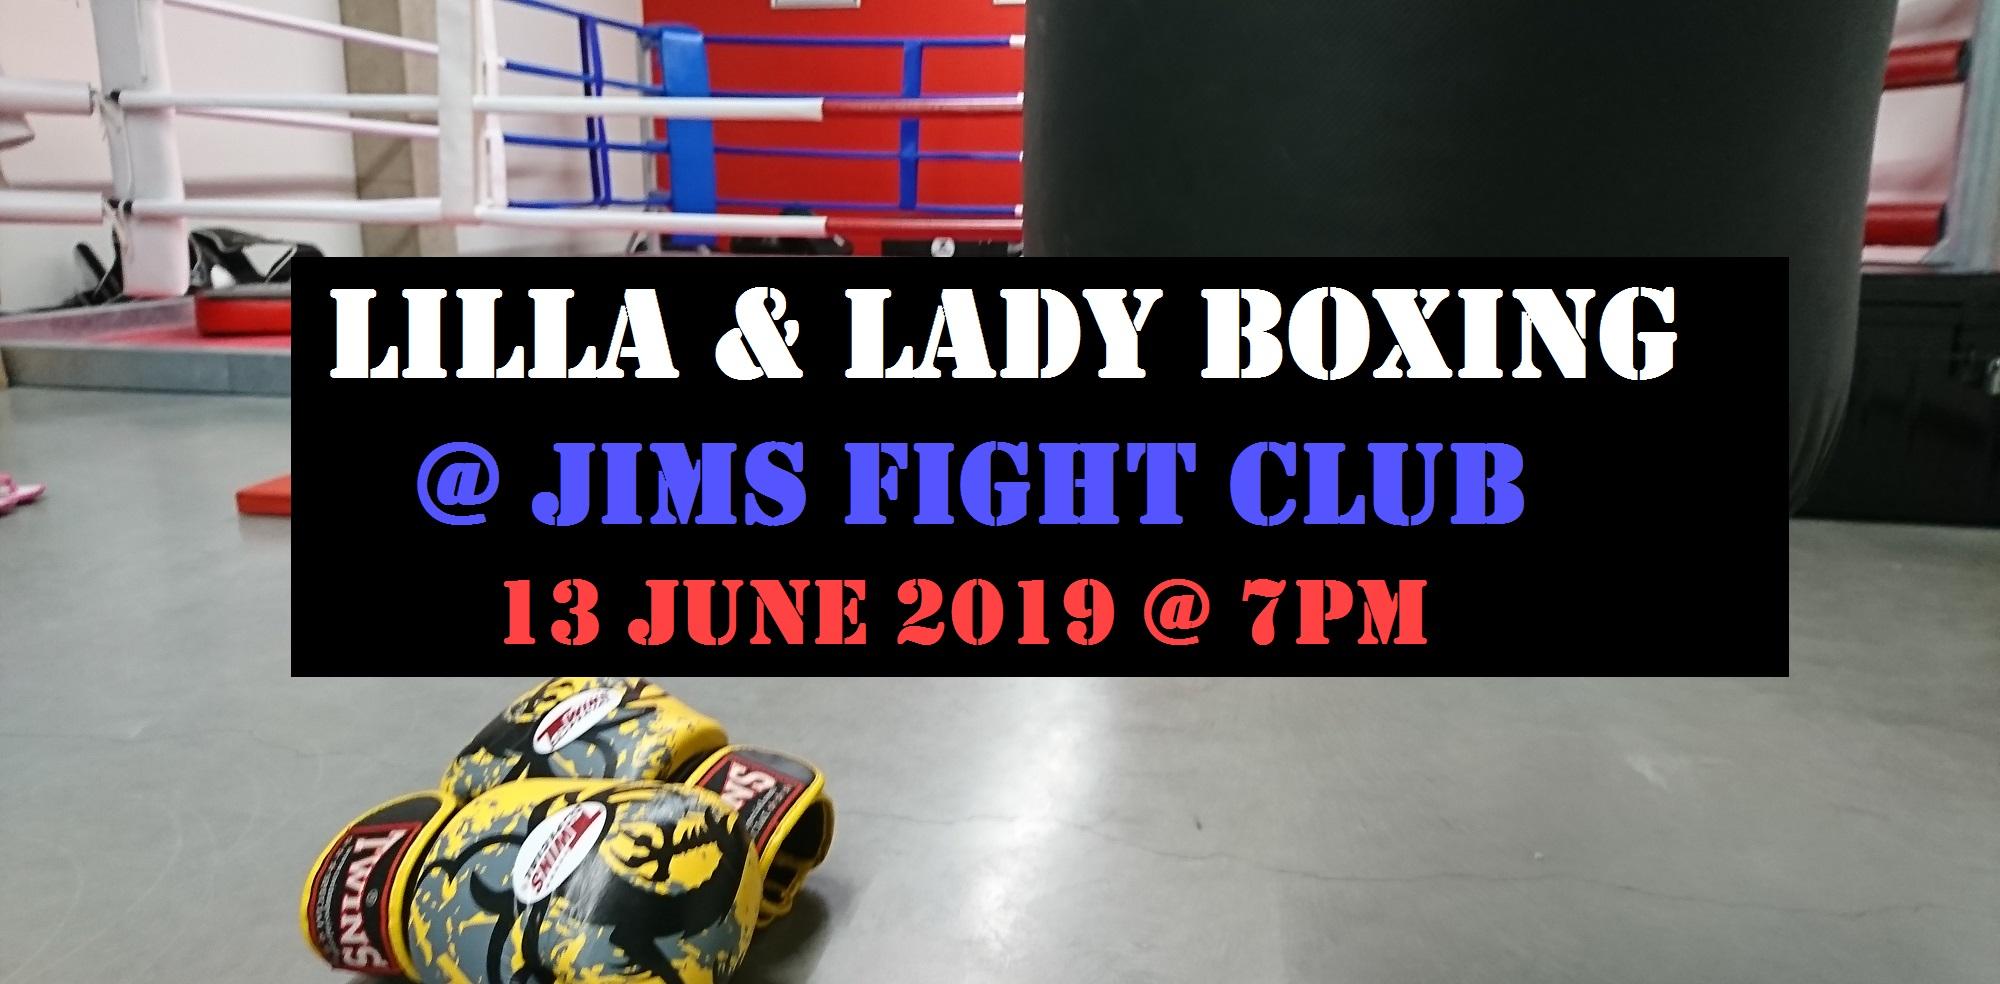 LILLA & Lady Boxing @ JIMS Fight Club